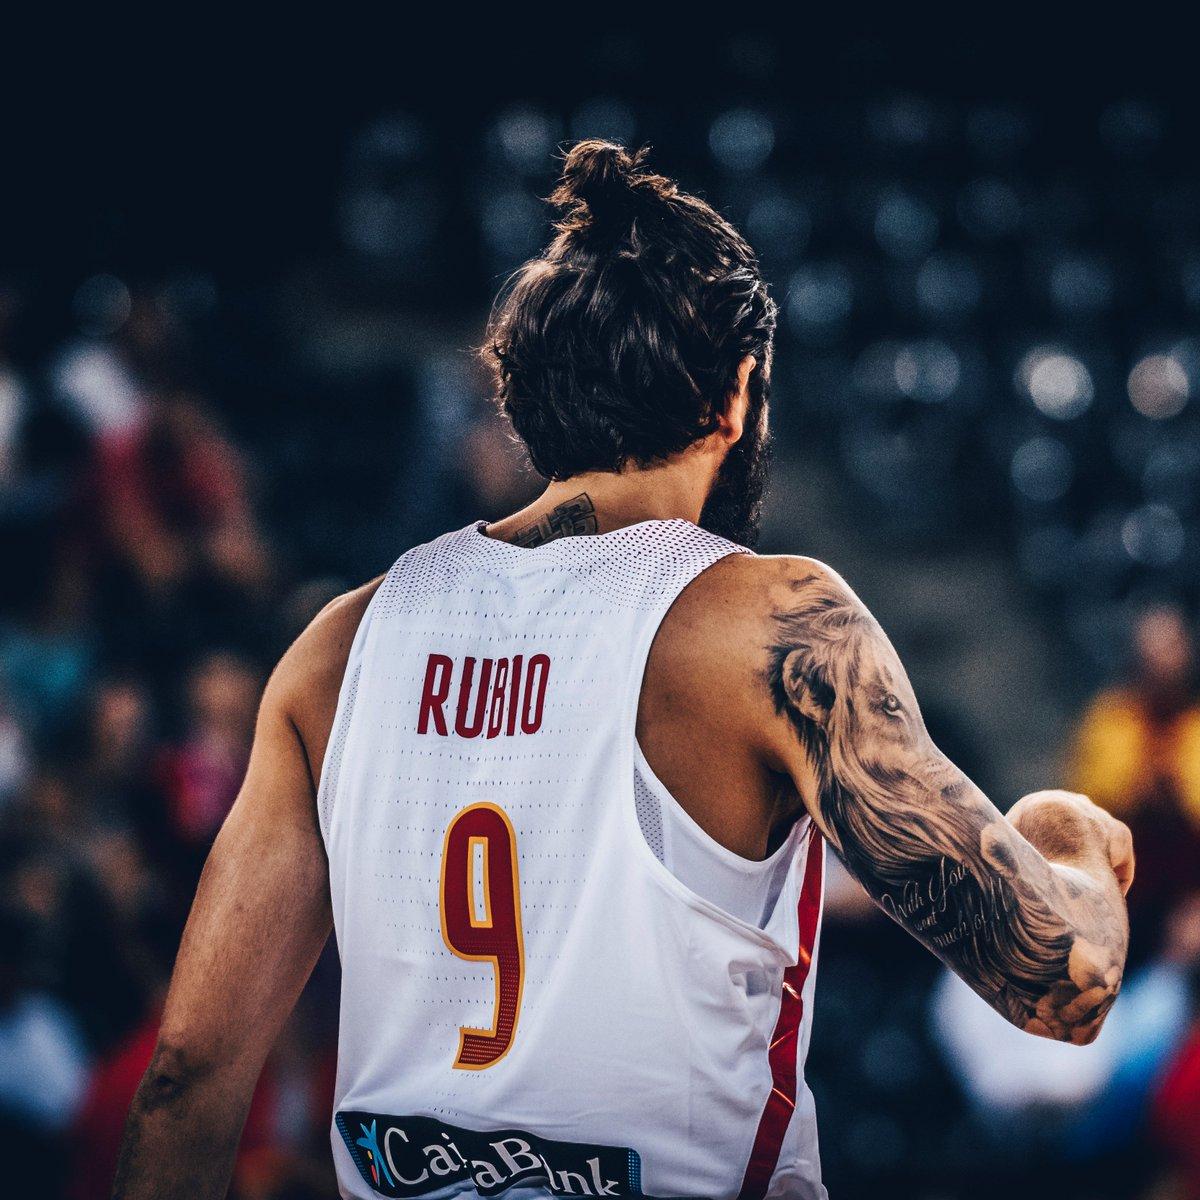 Fiba basketball on twitter rickyrubio9 39 s new look for Ricky rubio tattoo